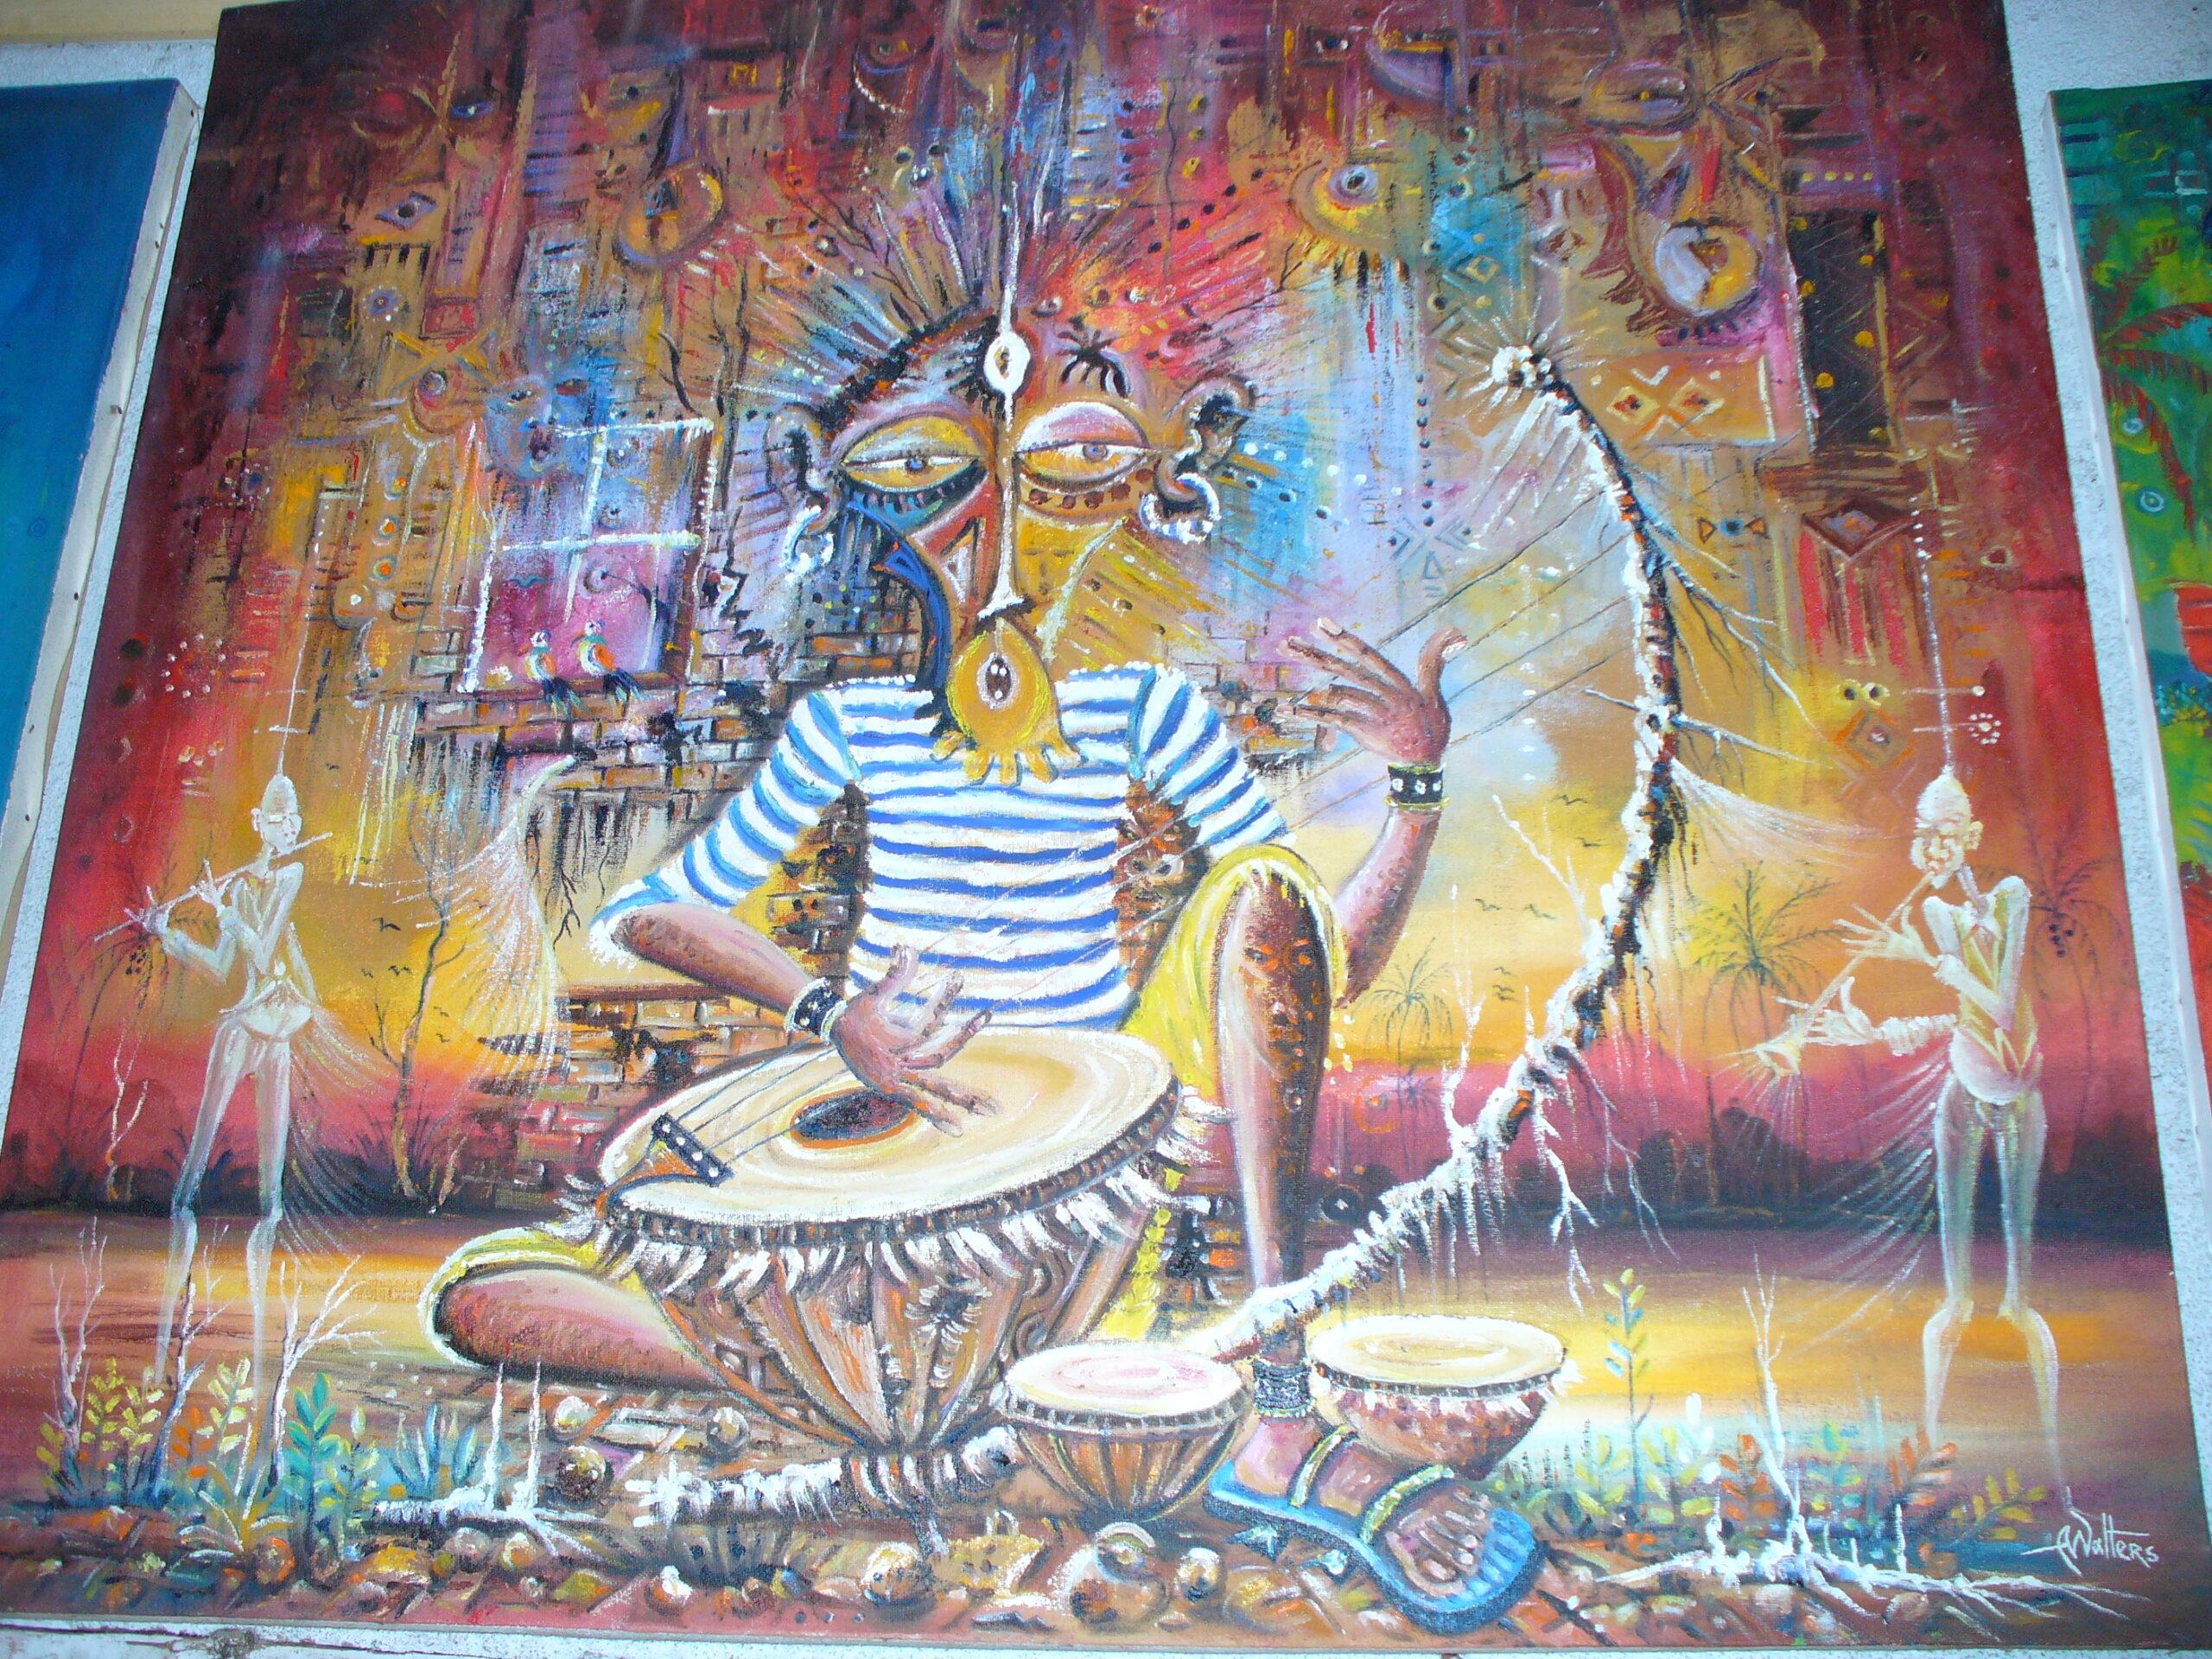 African drummer by Angu Walters